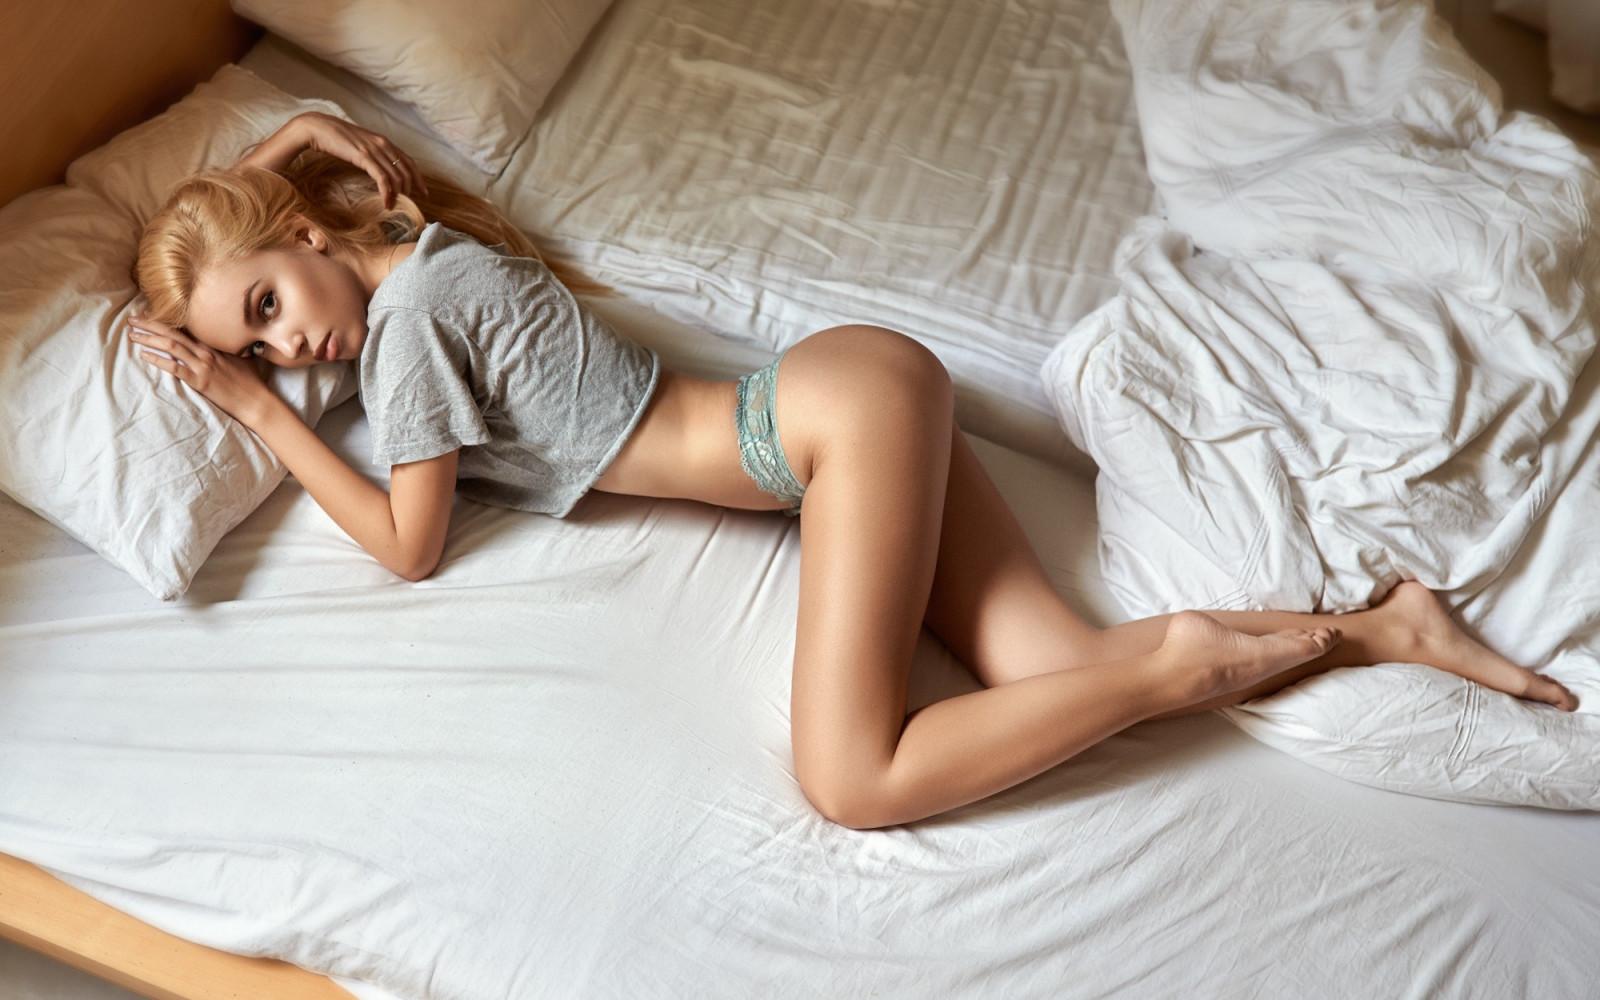 Картинки голых девушек блондинок на кровати